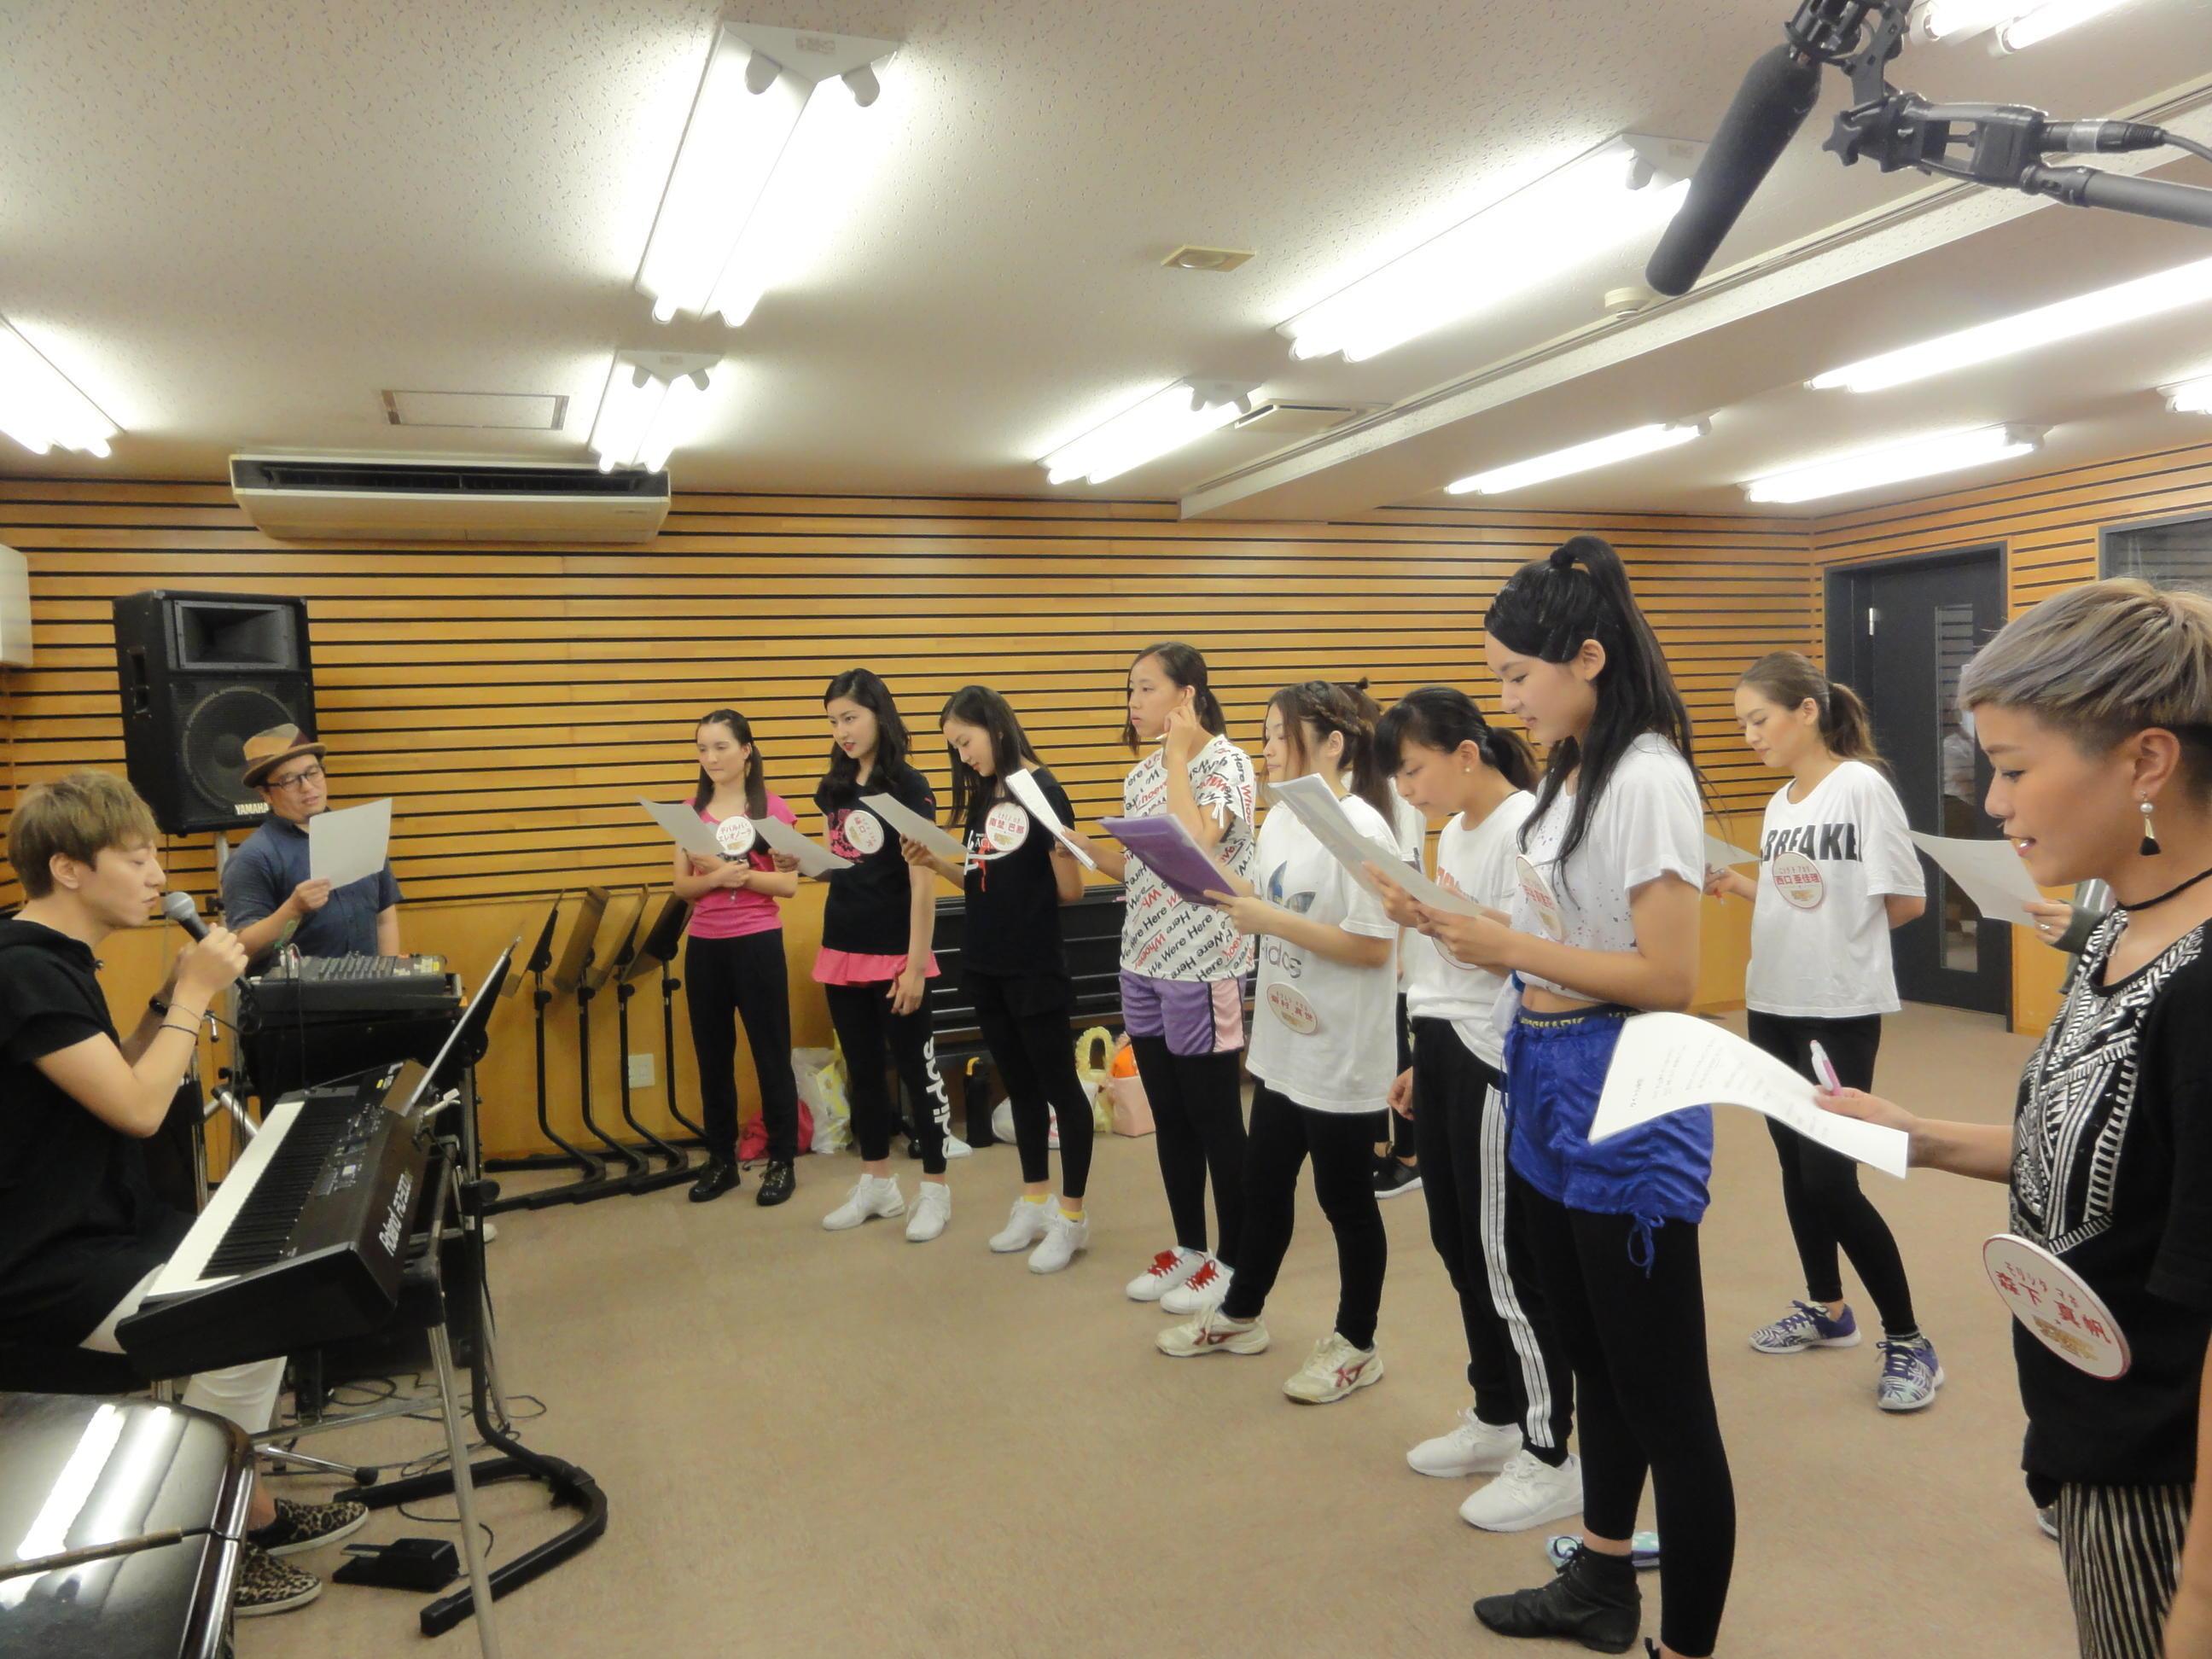 http://news.yoshimoto.co.jp/20170826103814-7e73cea4ab10f6854d075d56e6c7b0dfec01a82c.jpg